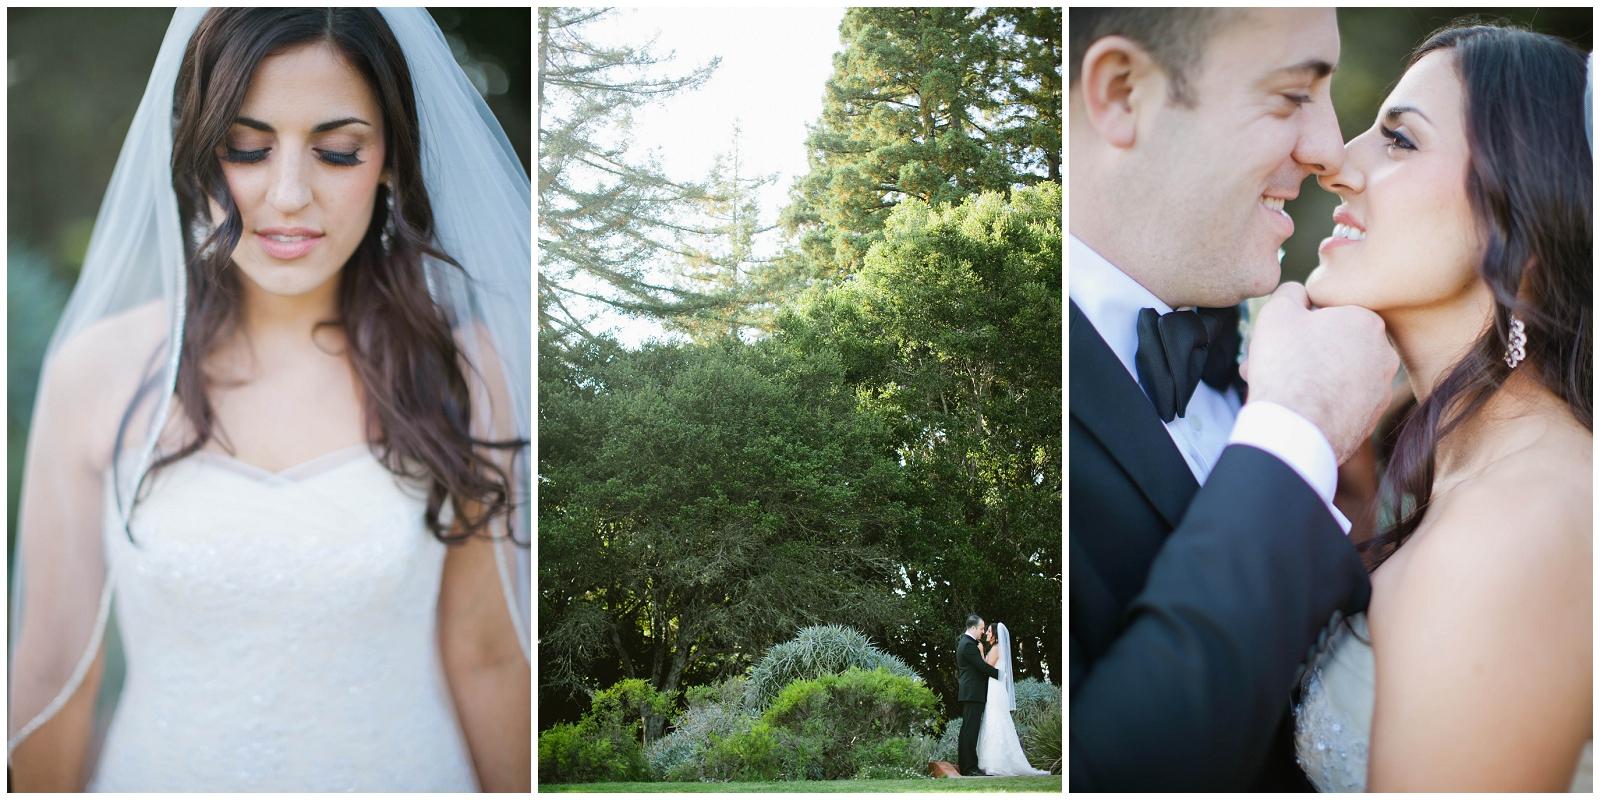 San-Francisco-Bay-Area-Wedding-Photography-Kennolyn-3.jpg